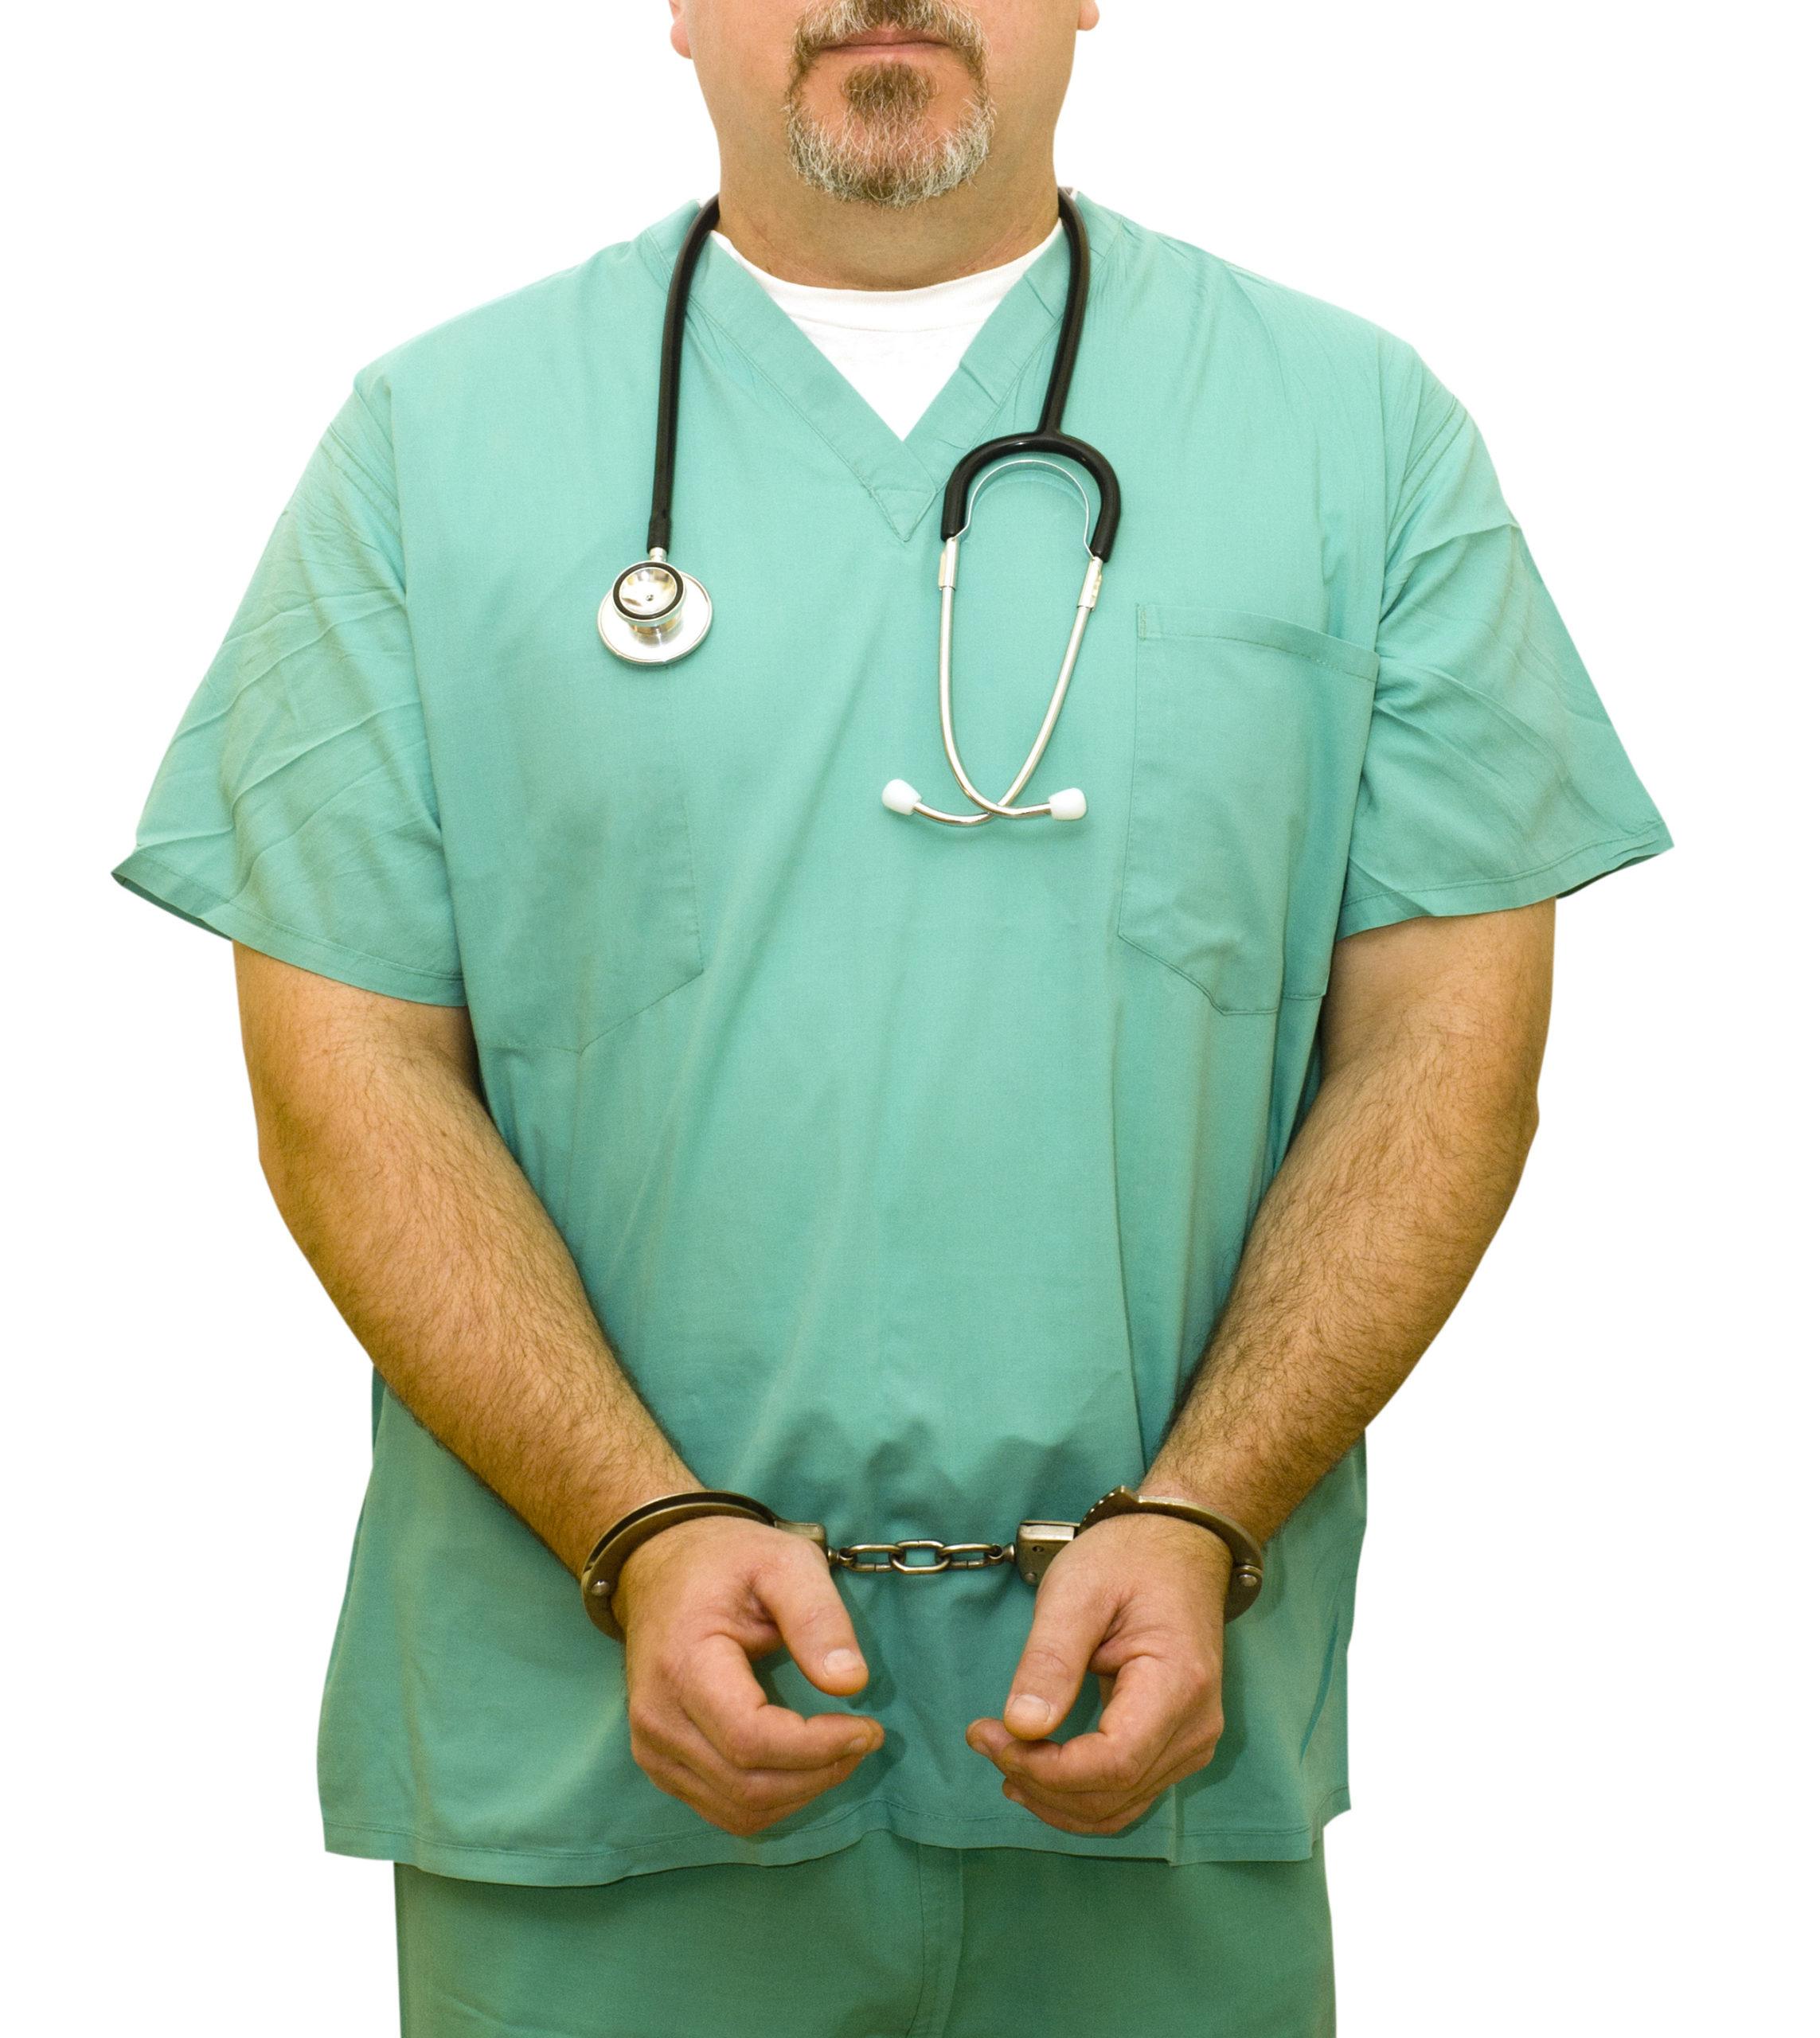 healthcare fraud attorneys carlsbad